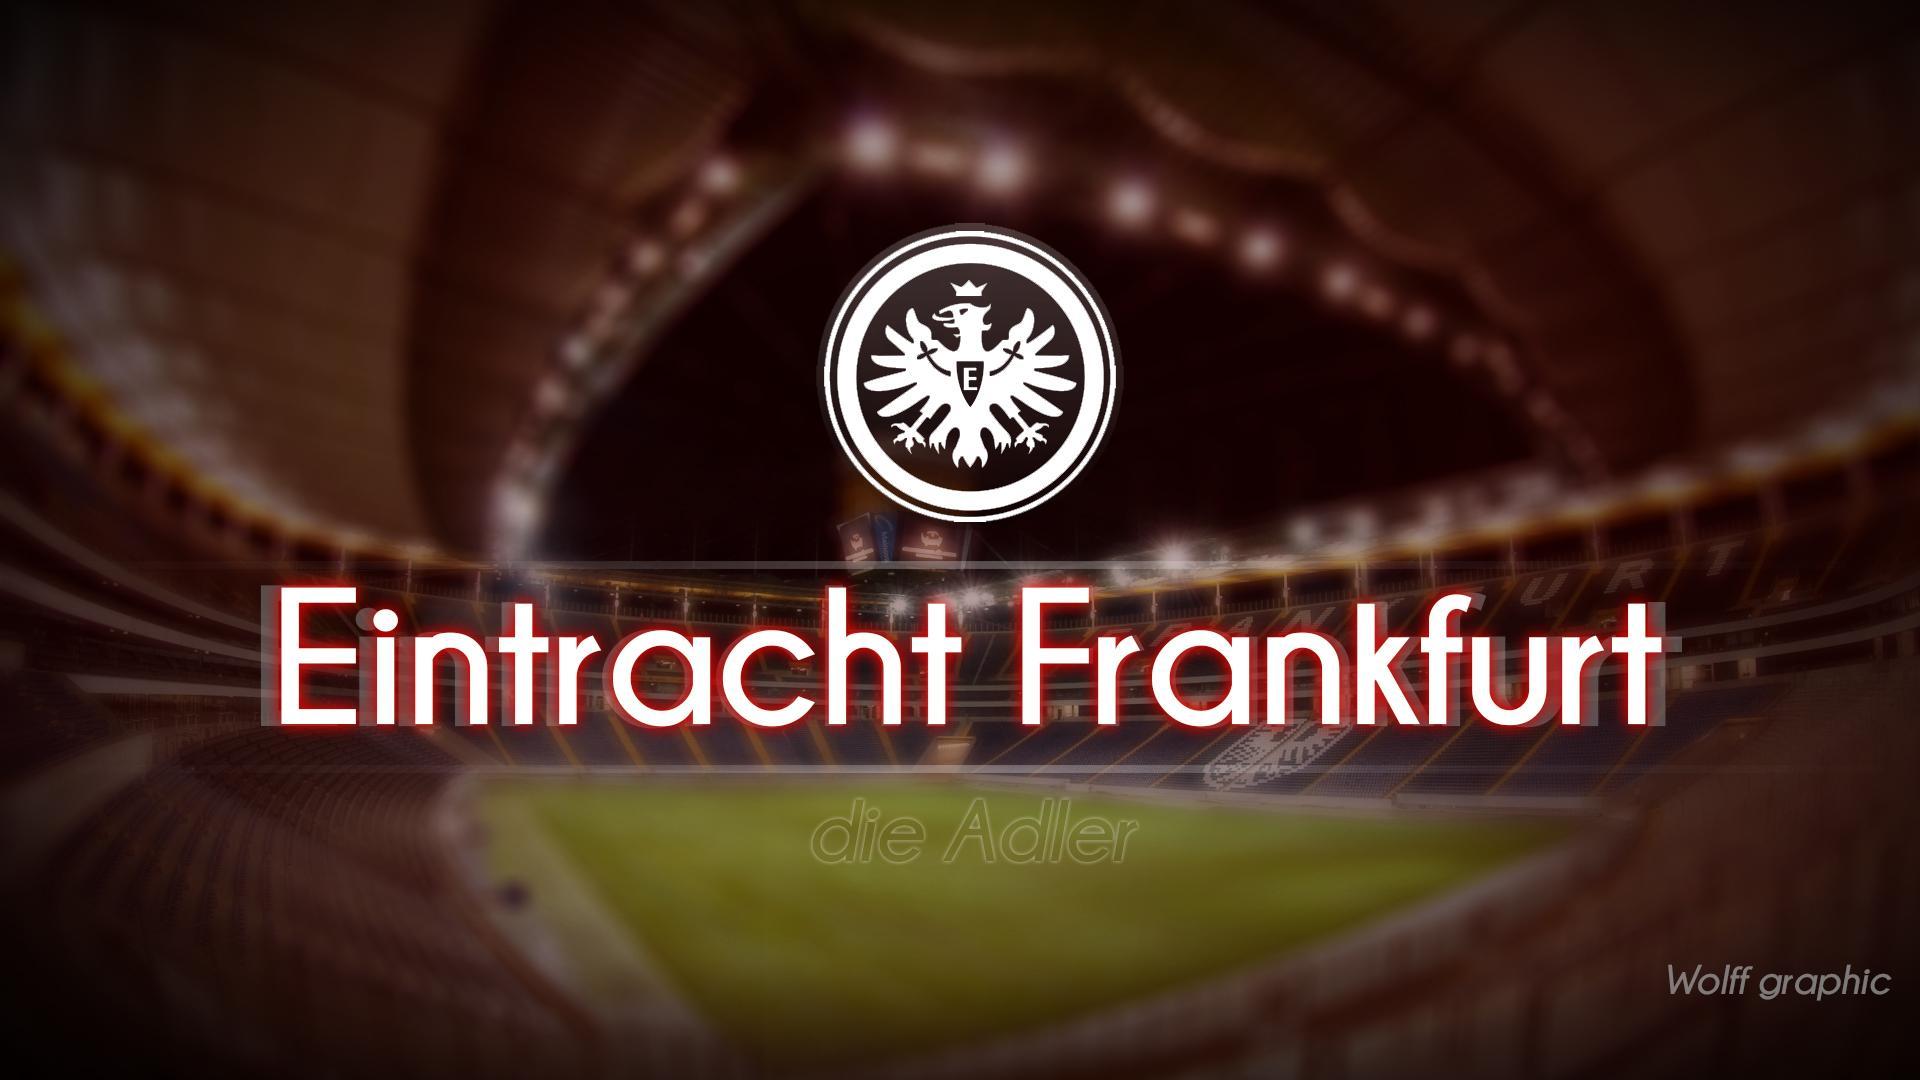 Eintracht Frankfurt Wallpaper Hd 2021